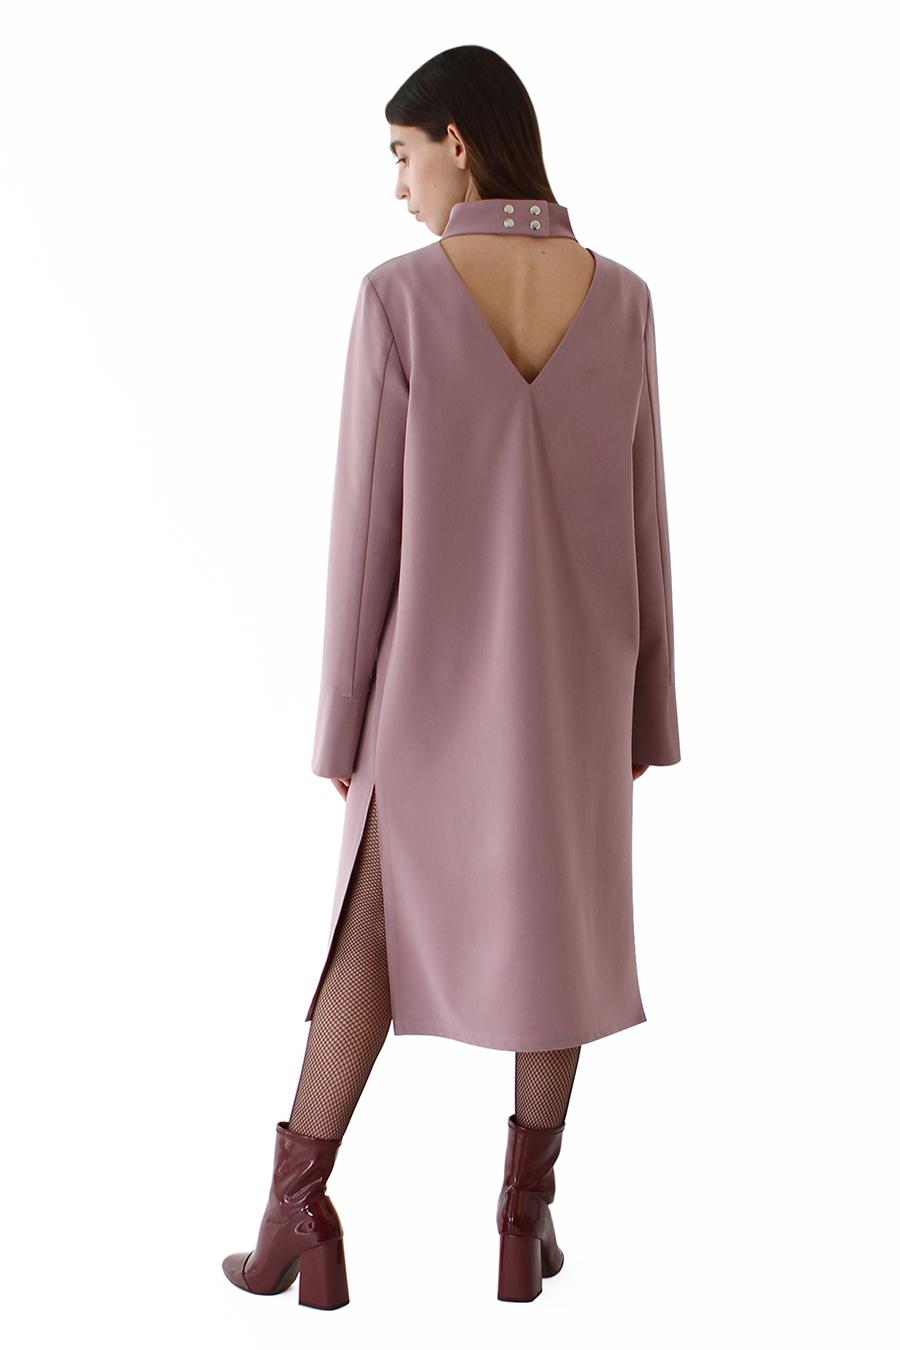 fw17k04-11 платье2